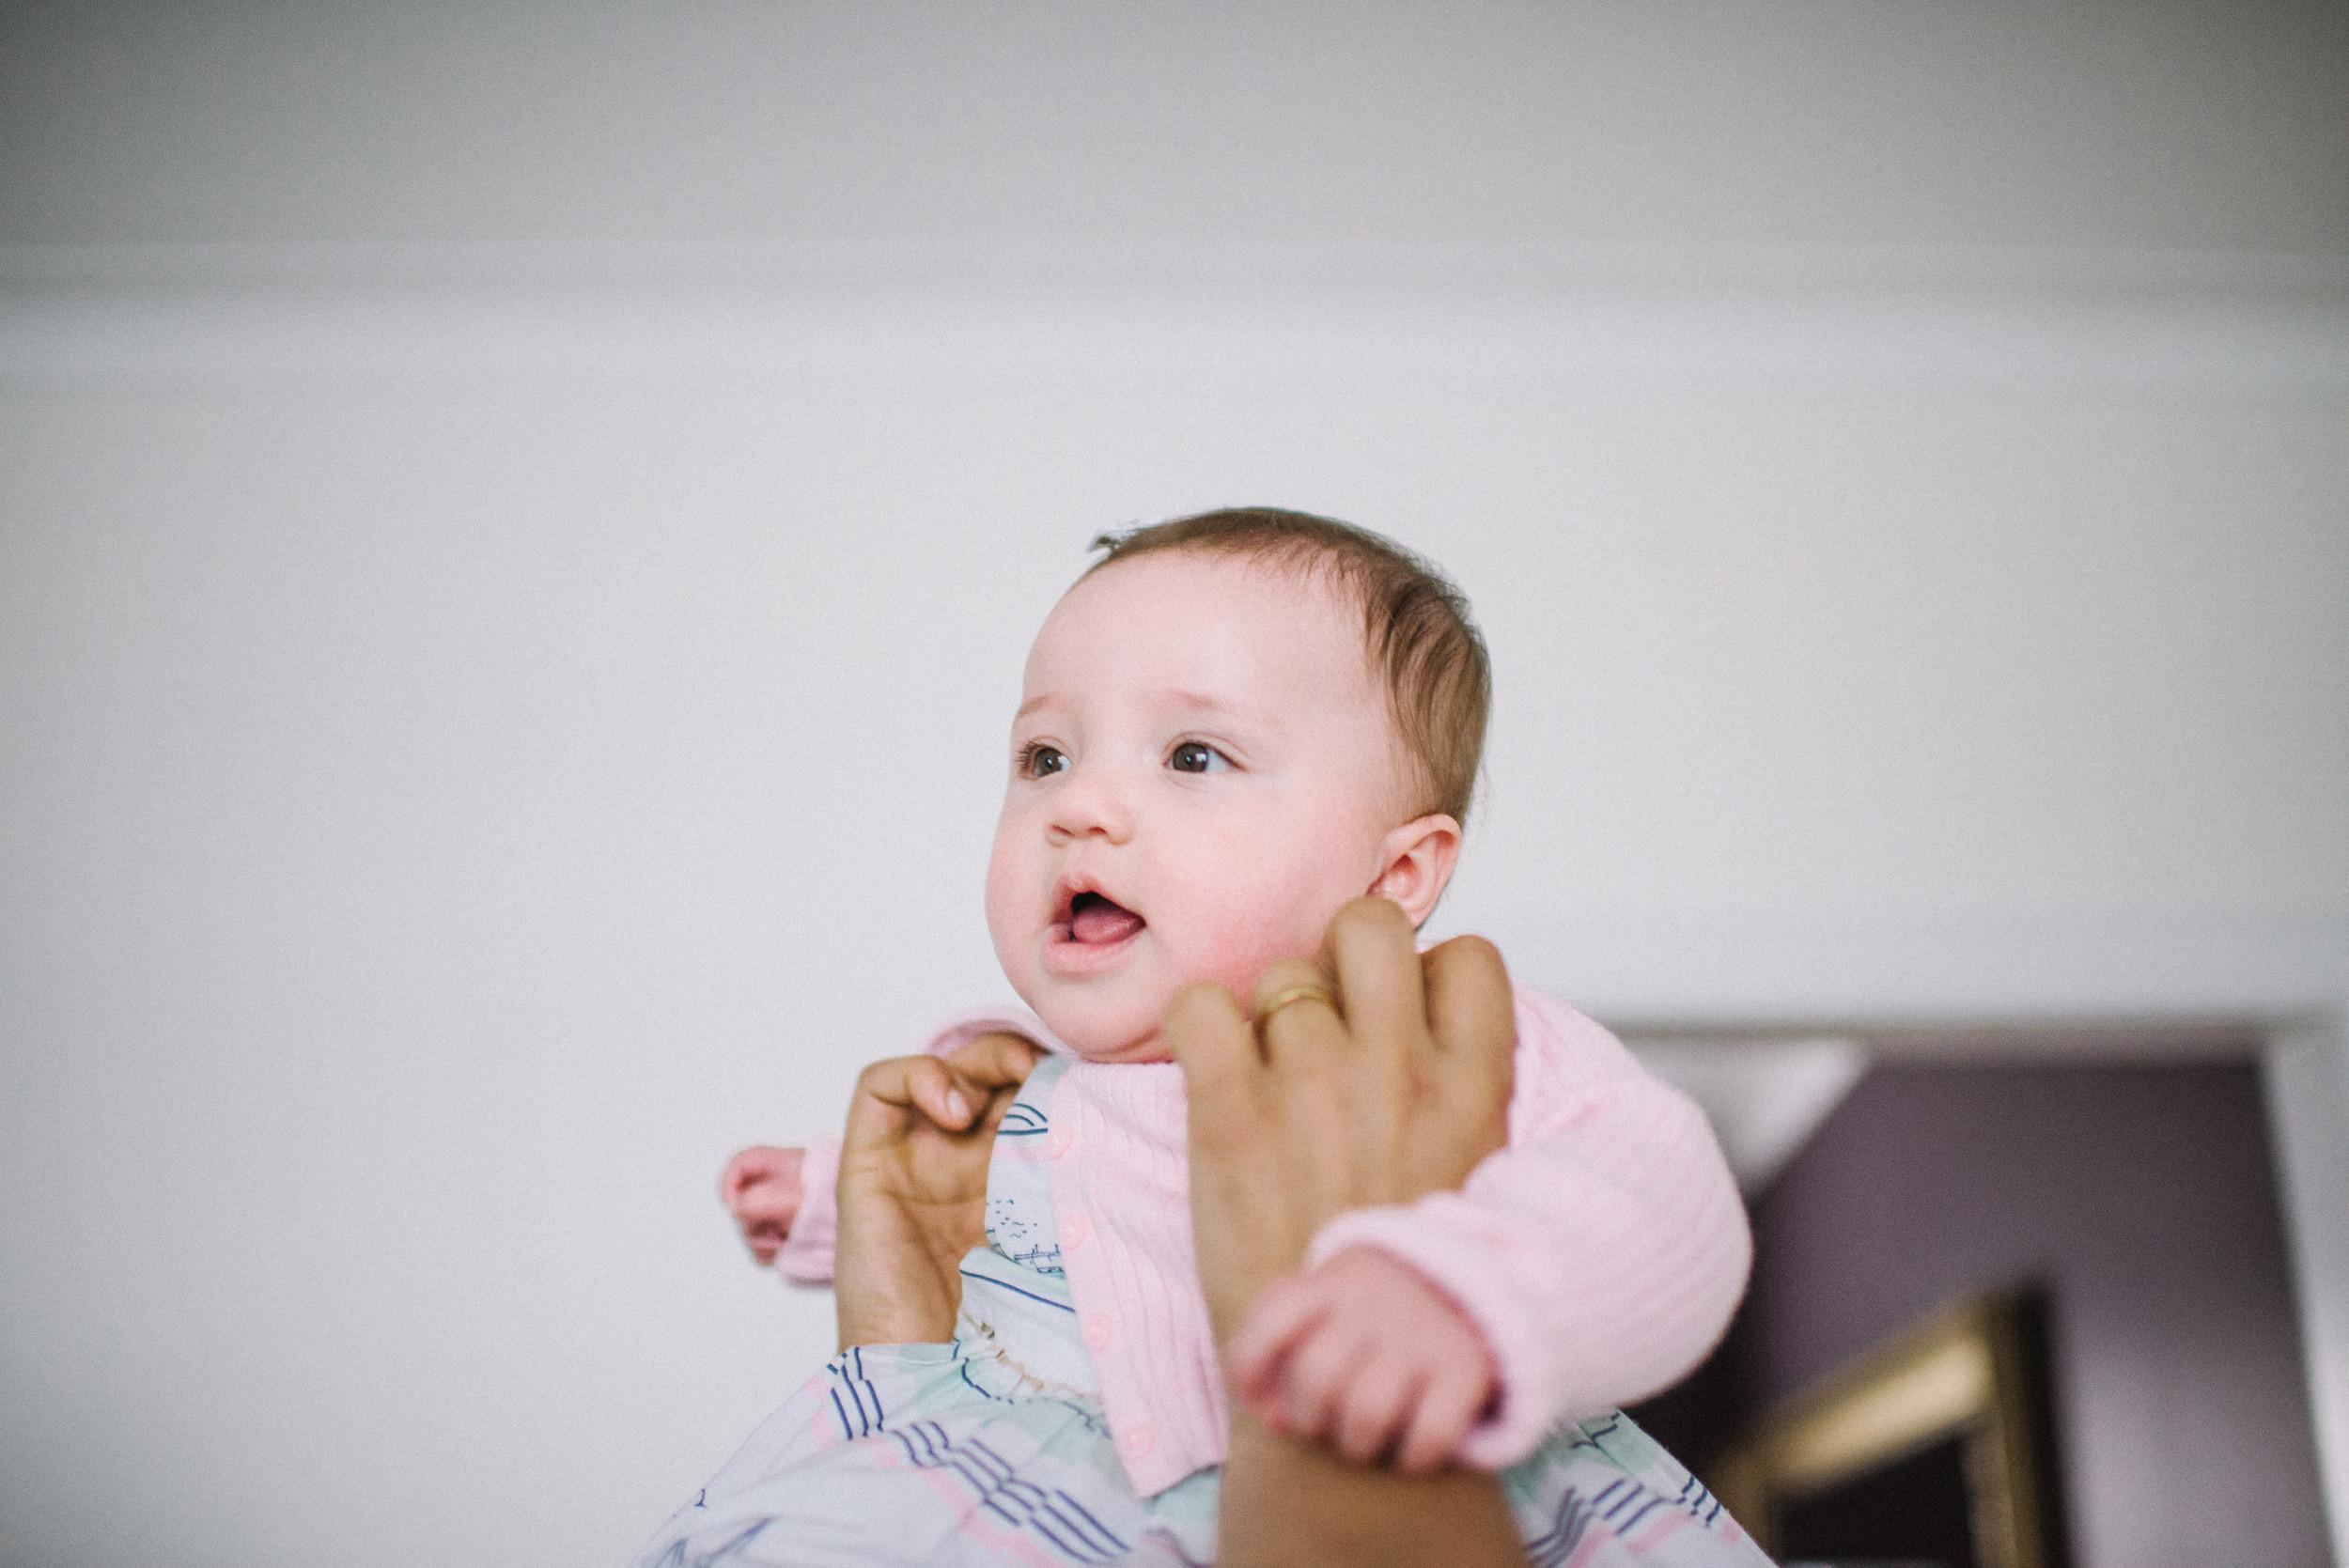 0044-ALTERNATIVE-WEDDING-PHOTOGRAPHER-GLASGOW-FAMILY-PHOTOGRAPHER-KIDS-PORTRAITS-BABY-PORTRAITS-GLASGOW.JPG